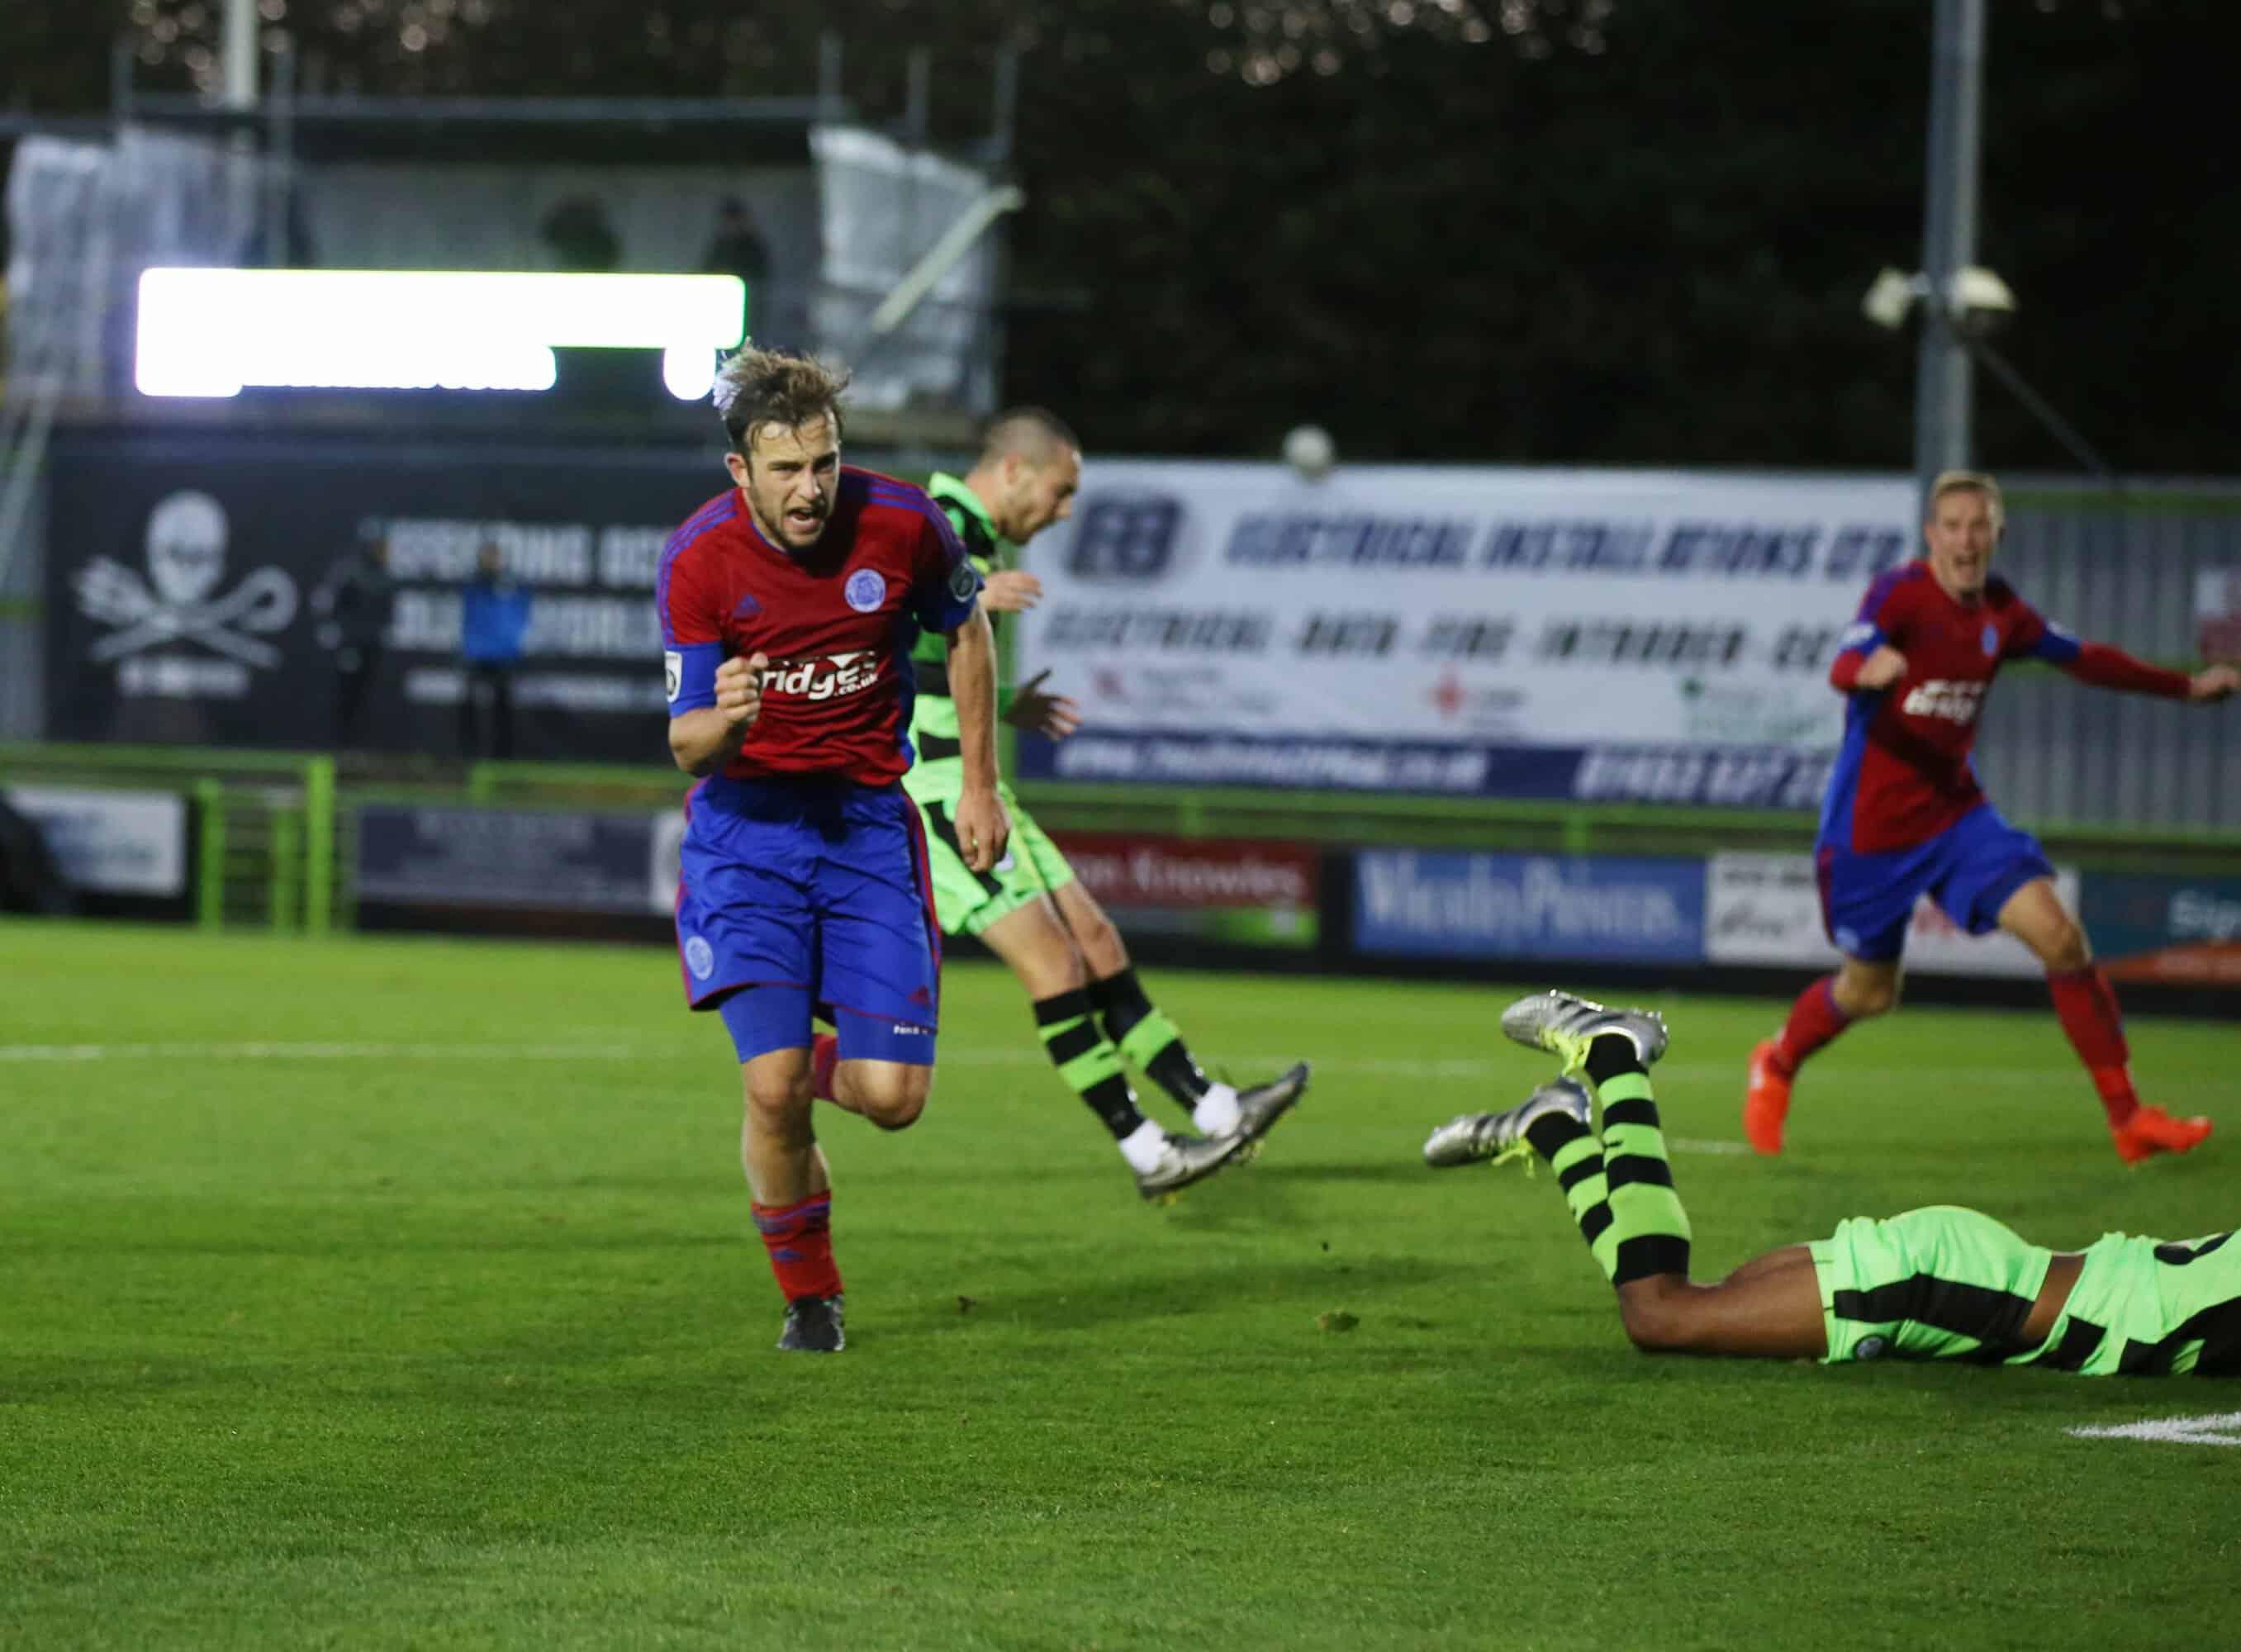 Forest Green Rovers 2 Aldershot Town 1 | Aldershot Town FC